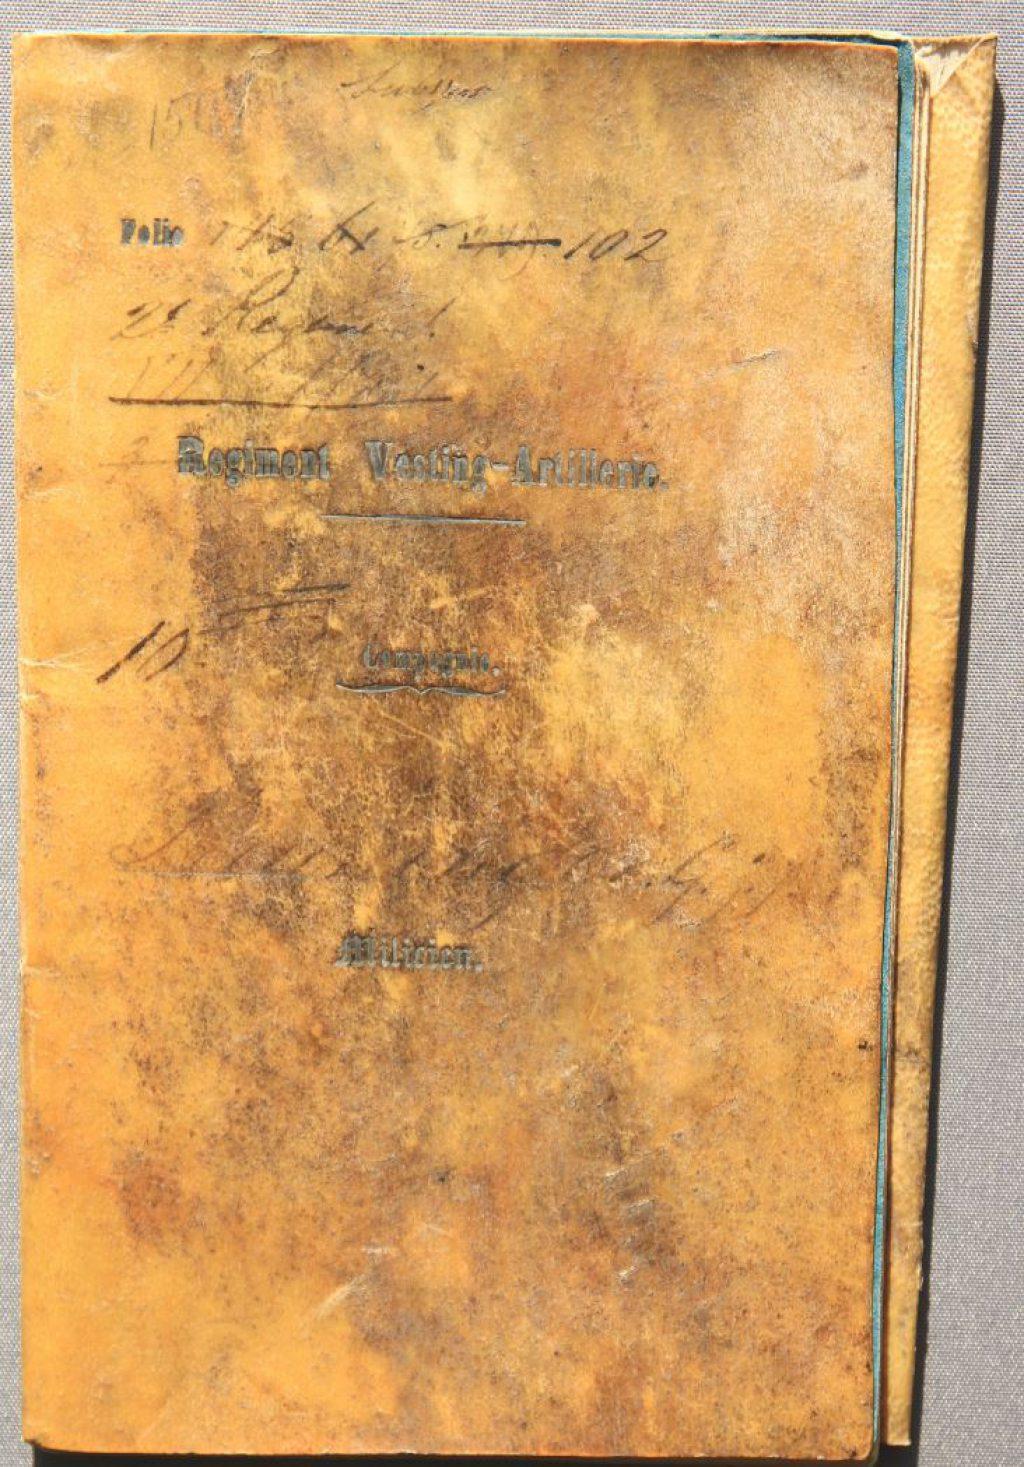 Militair zakboekje van G.J.J. Preuninger (Archief 598 inv.nr 897)